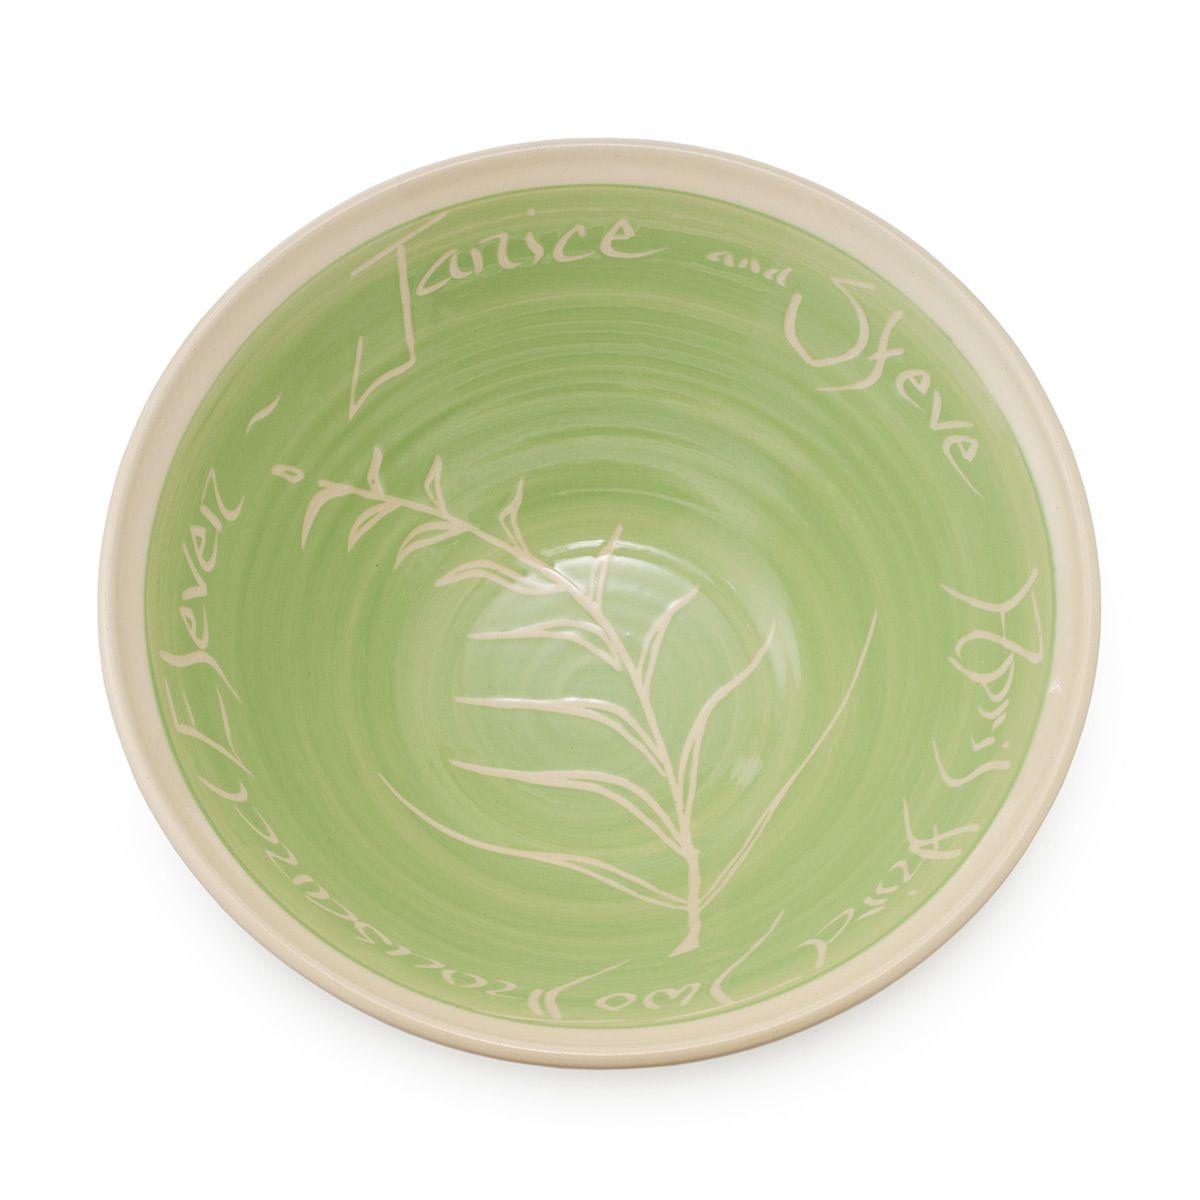 Personalized Wedding Bowl